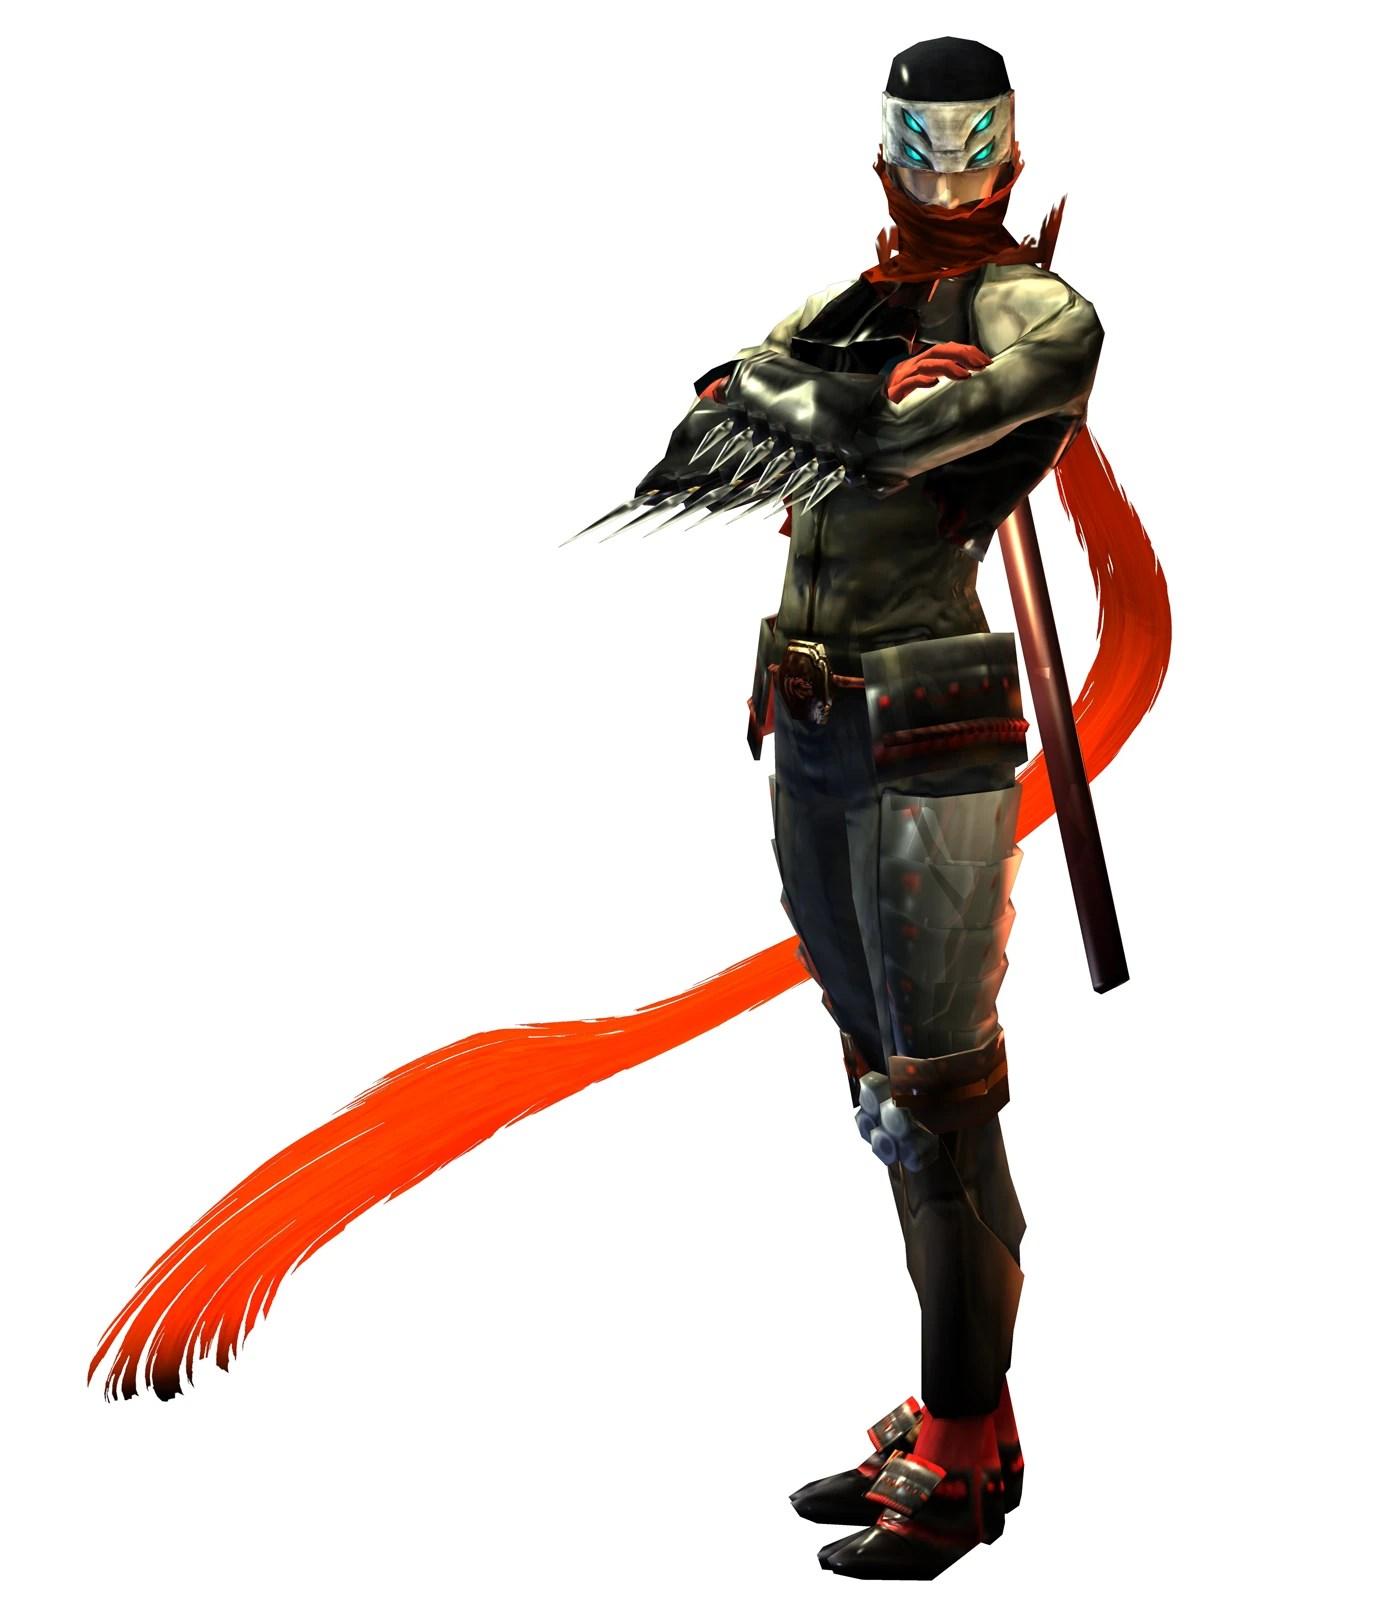 Category:Characters | Shinobi Wiki | Fandom powered by Wikia